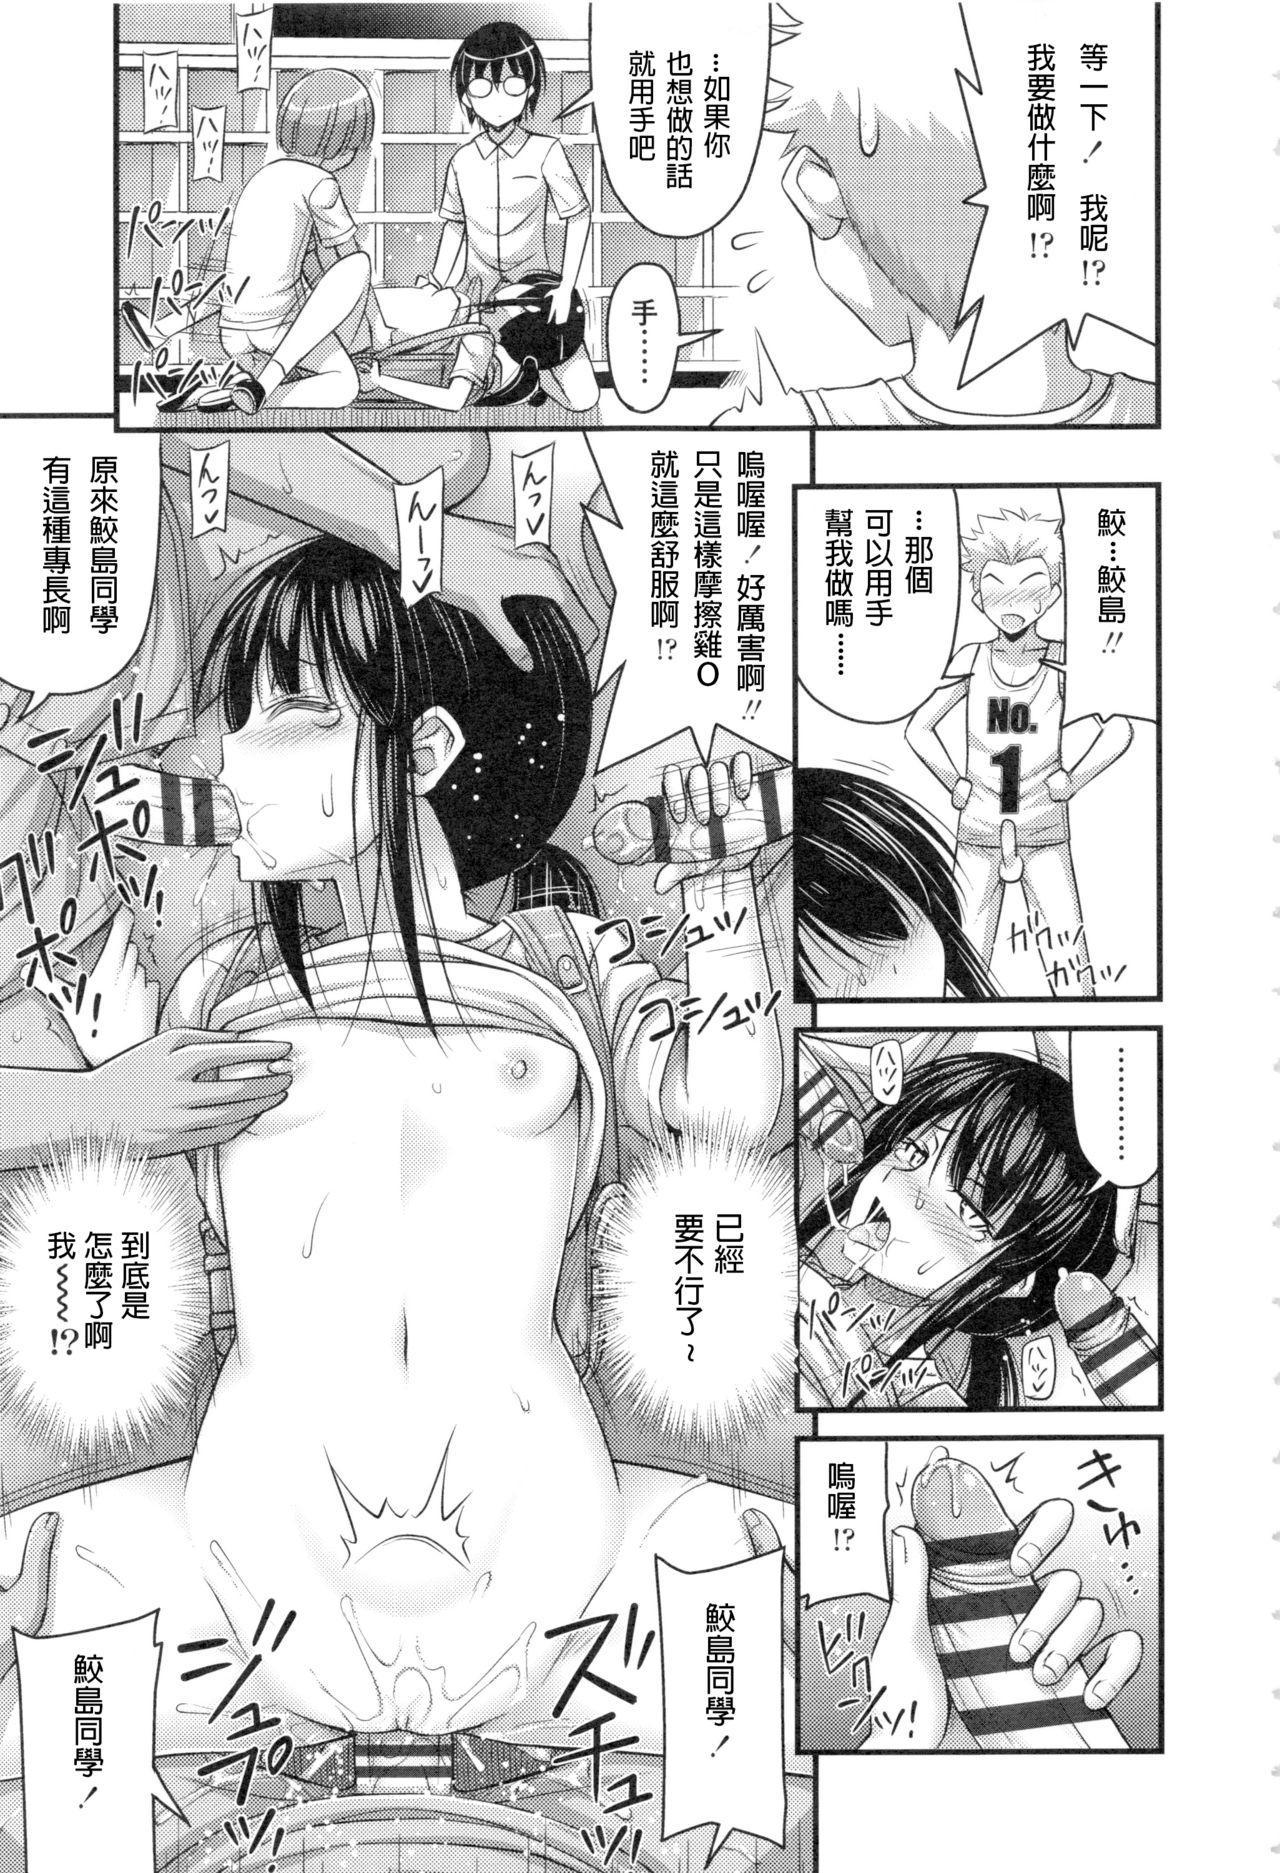 Onii-chan Sonna ni Short Pants Suki nano? 76